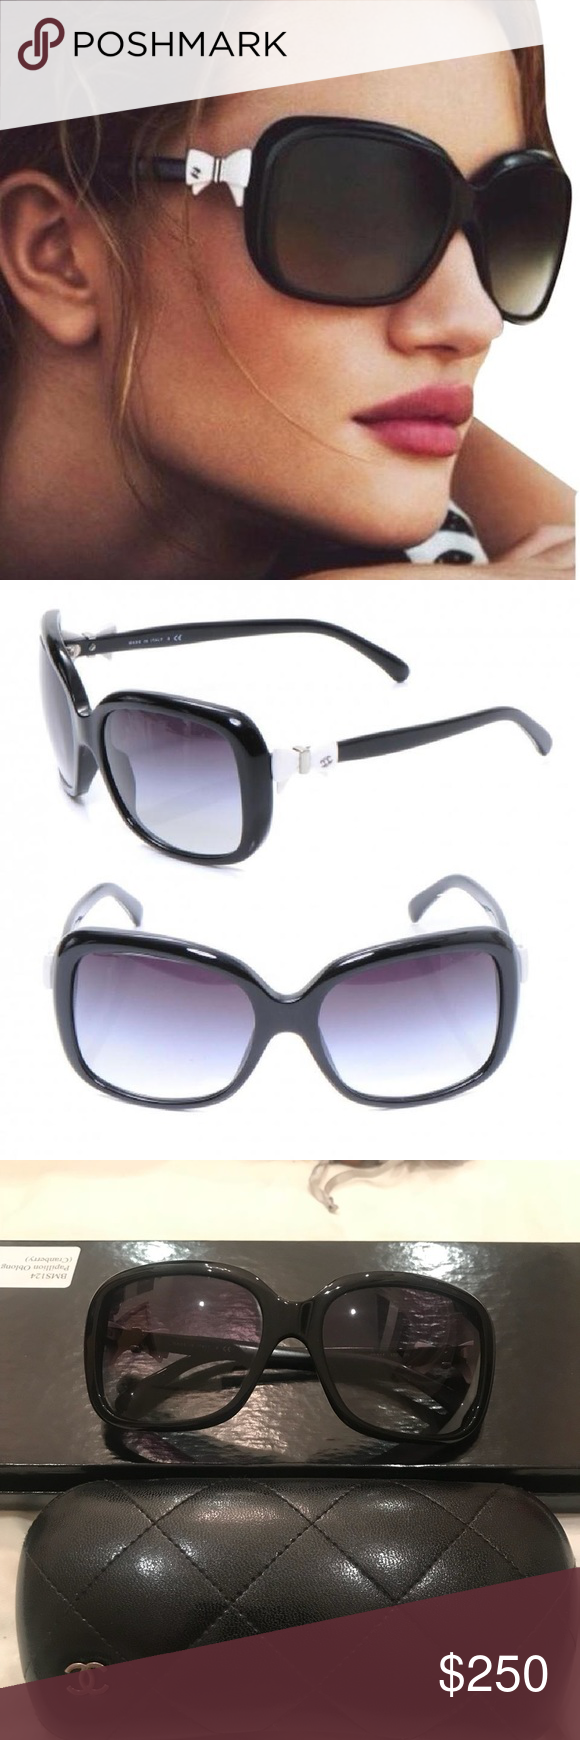 b161d6d625 Chanel Bow Tie Ribbon Logo Square Tie Sunglasses Chanel 5171 Bow Tie Ribbon  Logo Square Tie